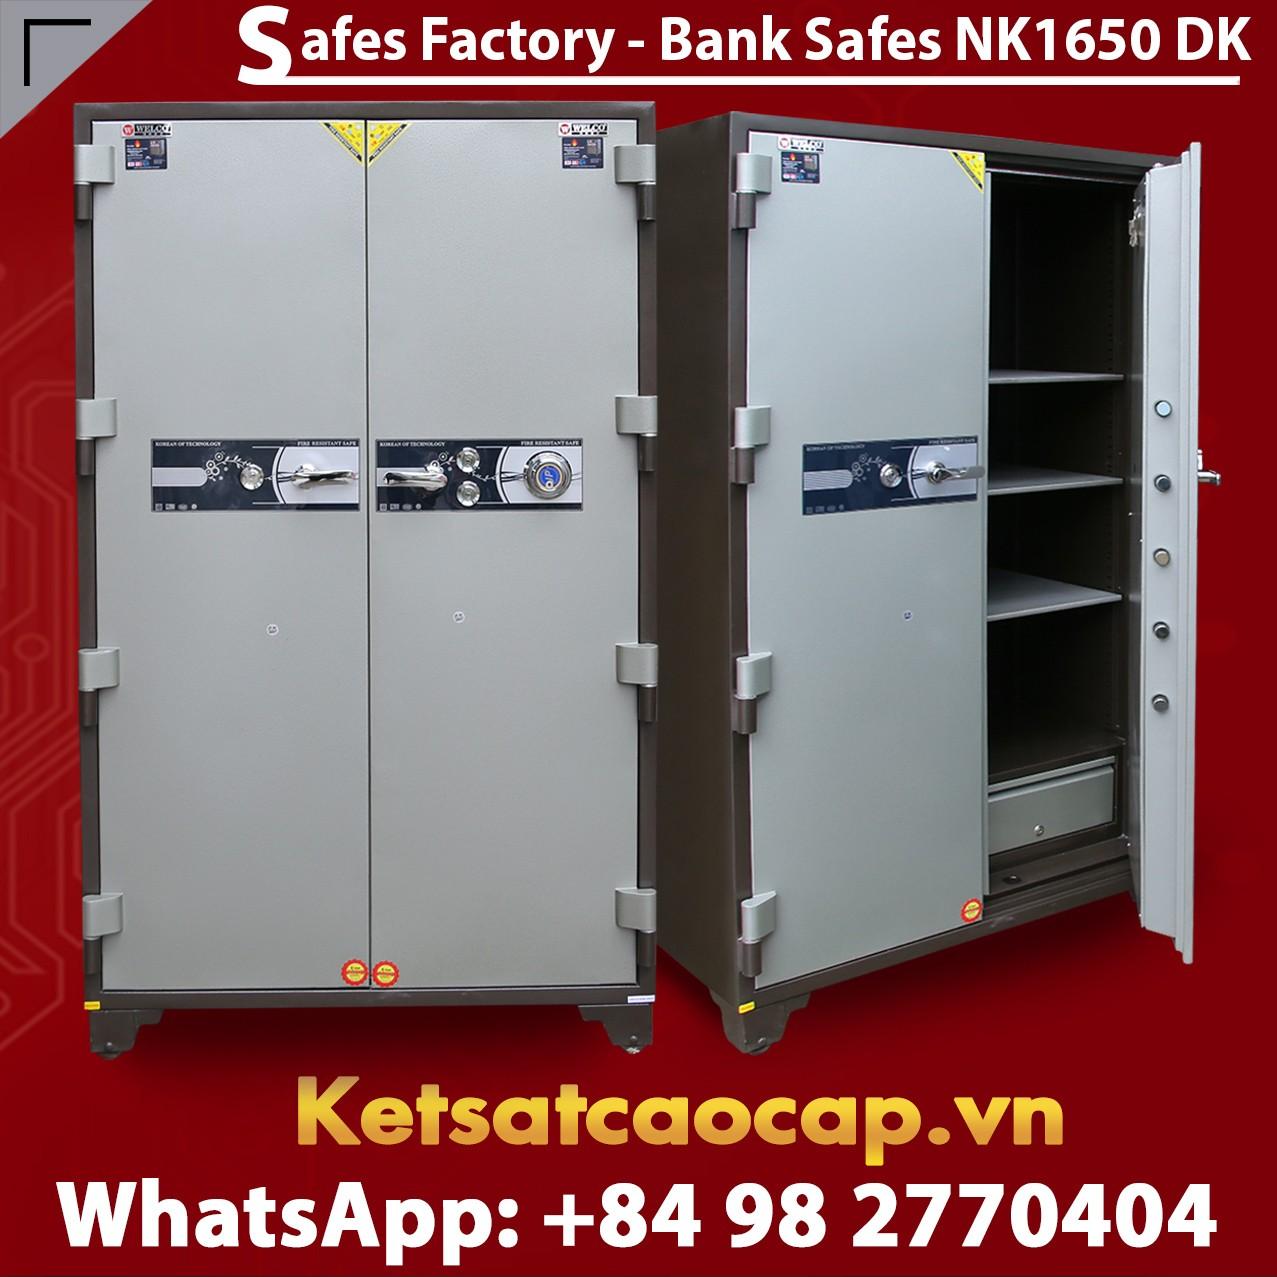 Bank Safes NK 1650 DK Two Door Fingerprint Locking Customized